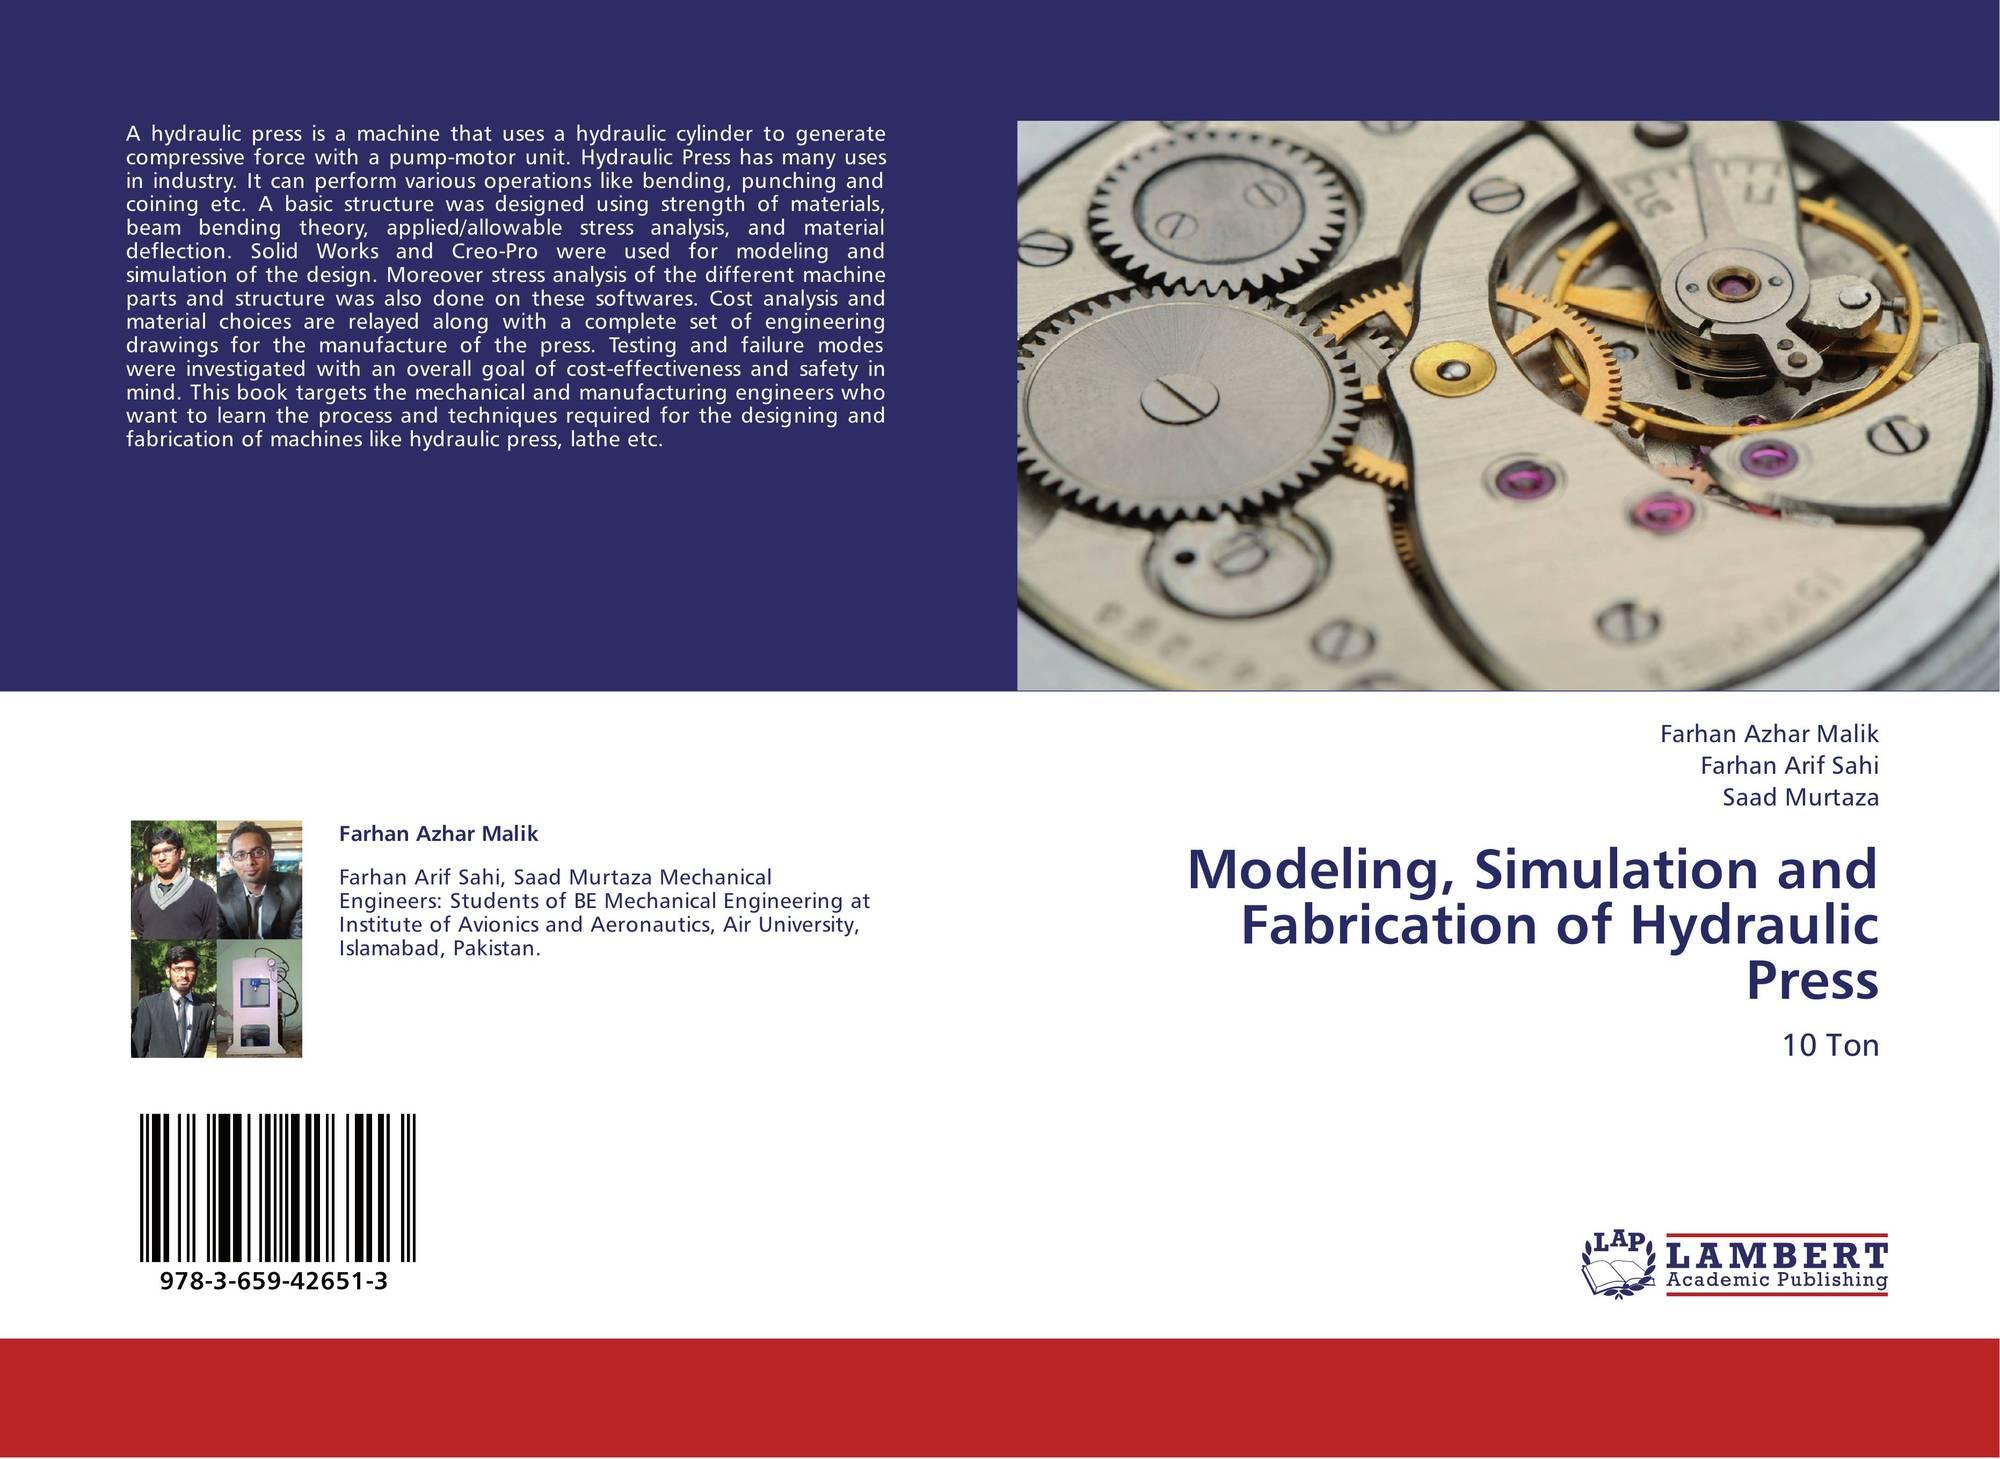 Modeling, Simulation and Fabrication of Hydraulic Press, 978